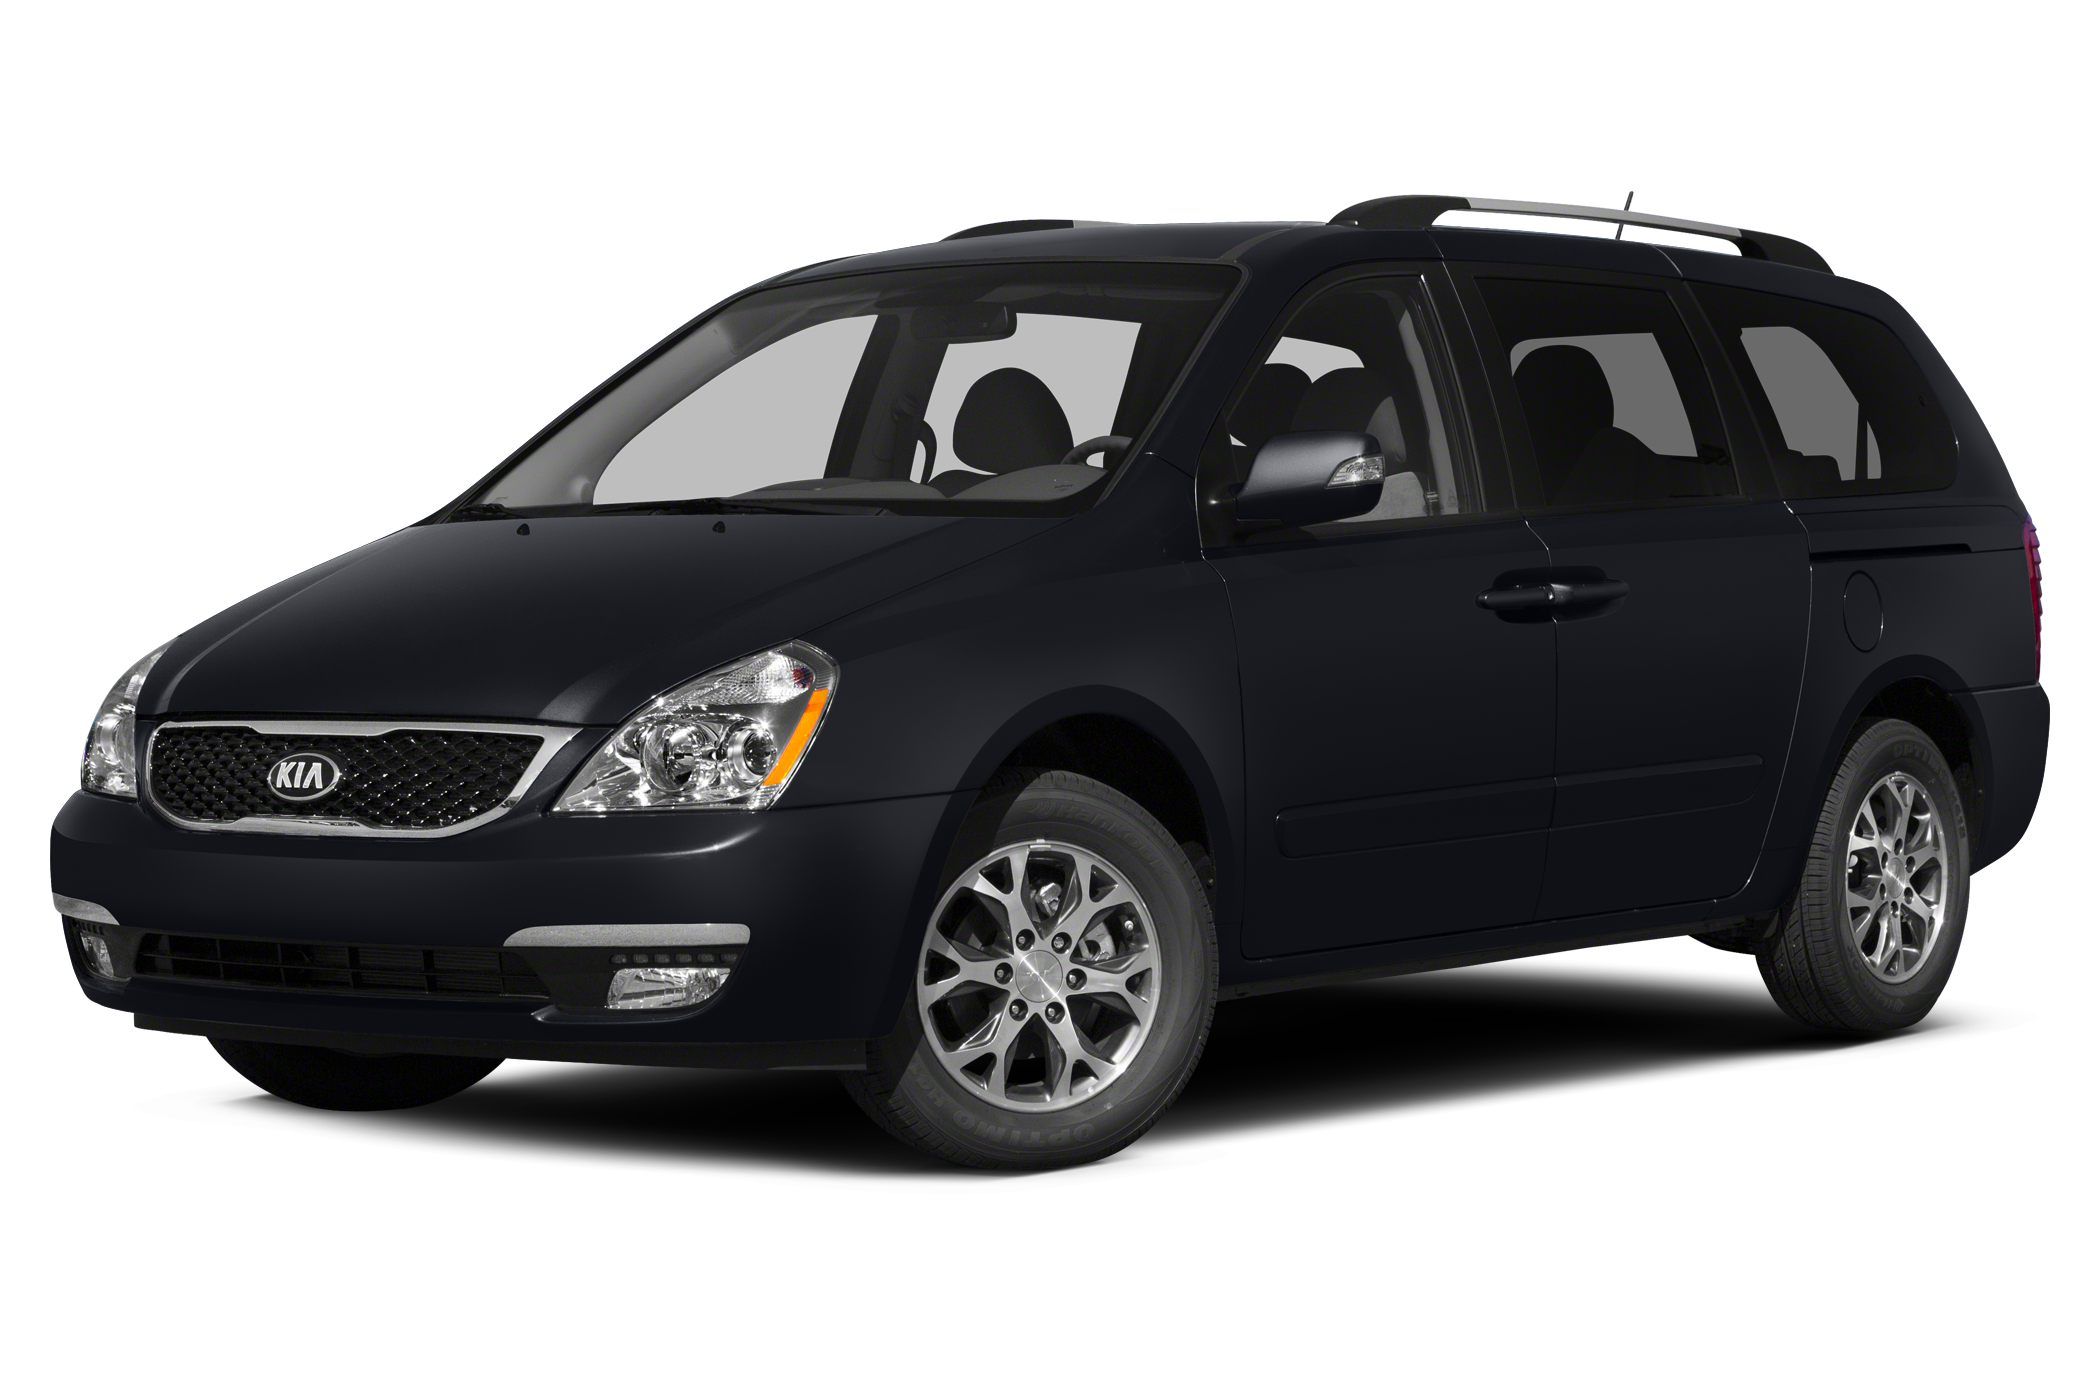 2014 Kia Sedona EX Minivan for sale in Milwaukee for $34,724 with 9 miles.